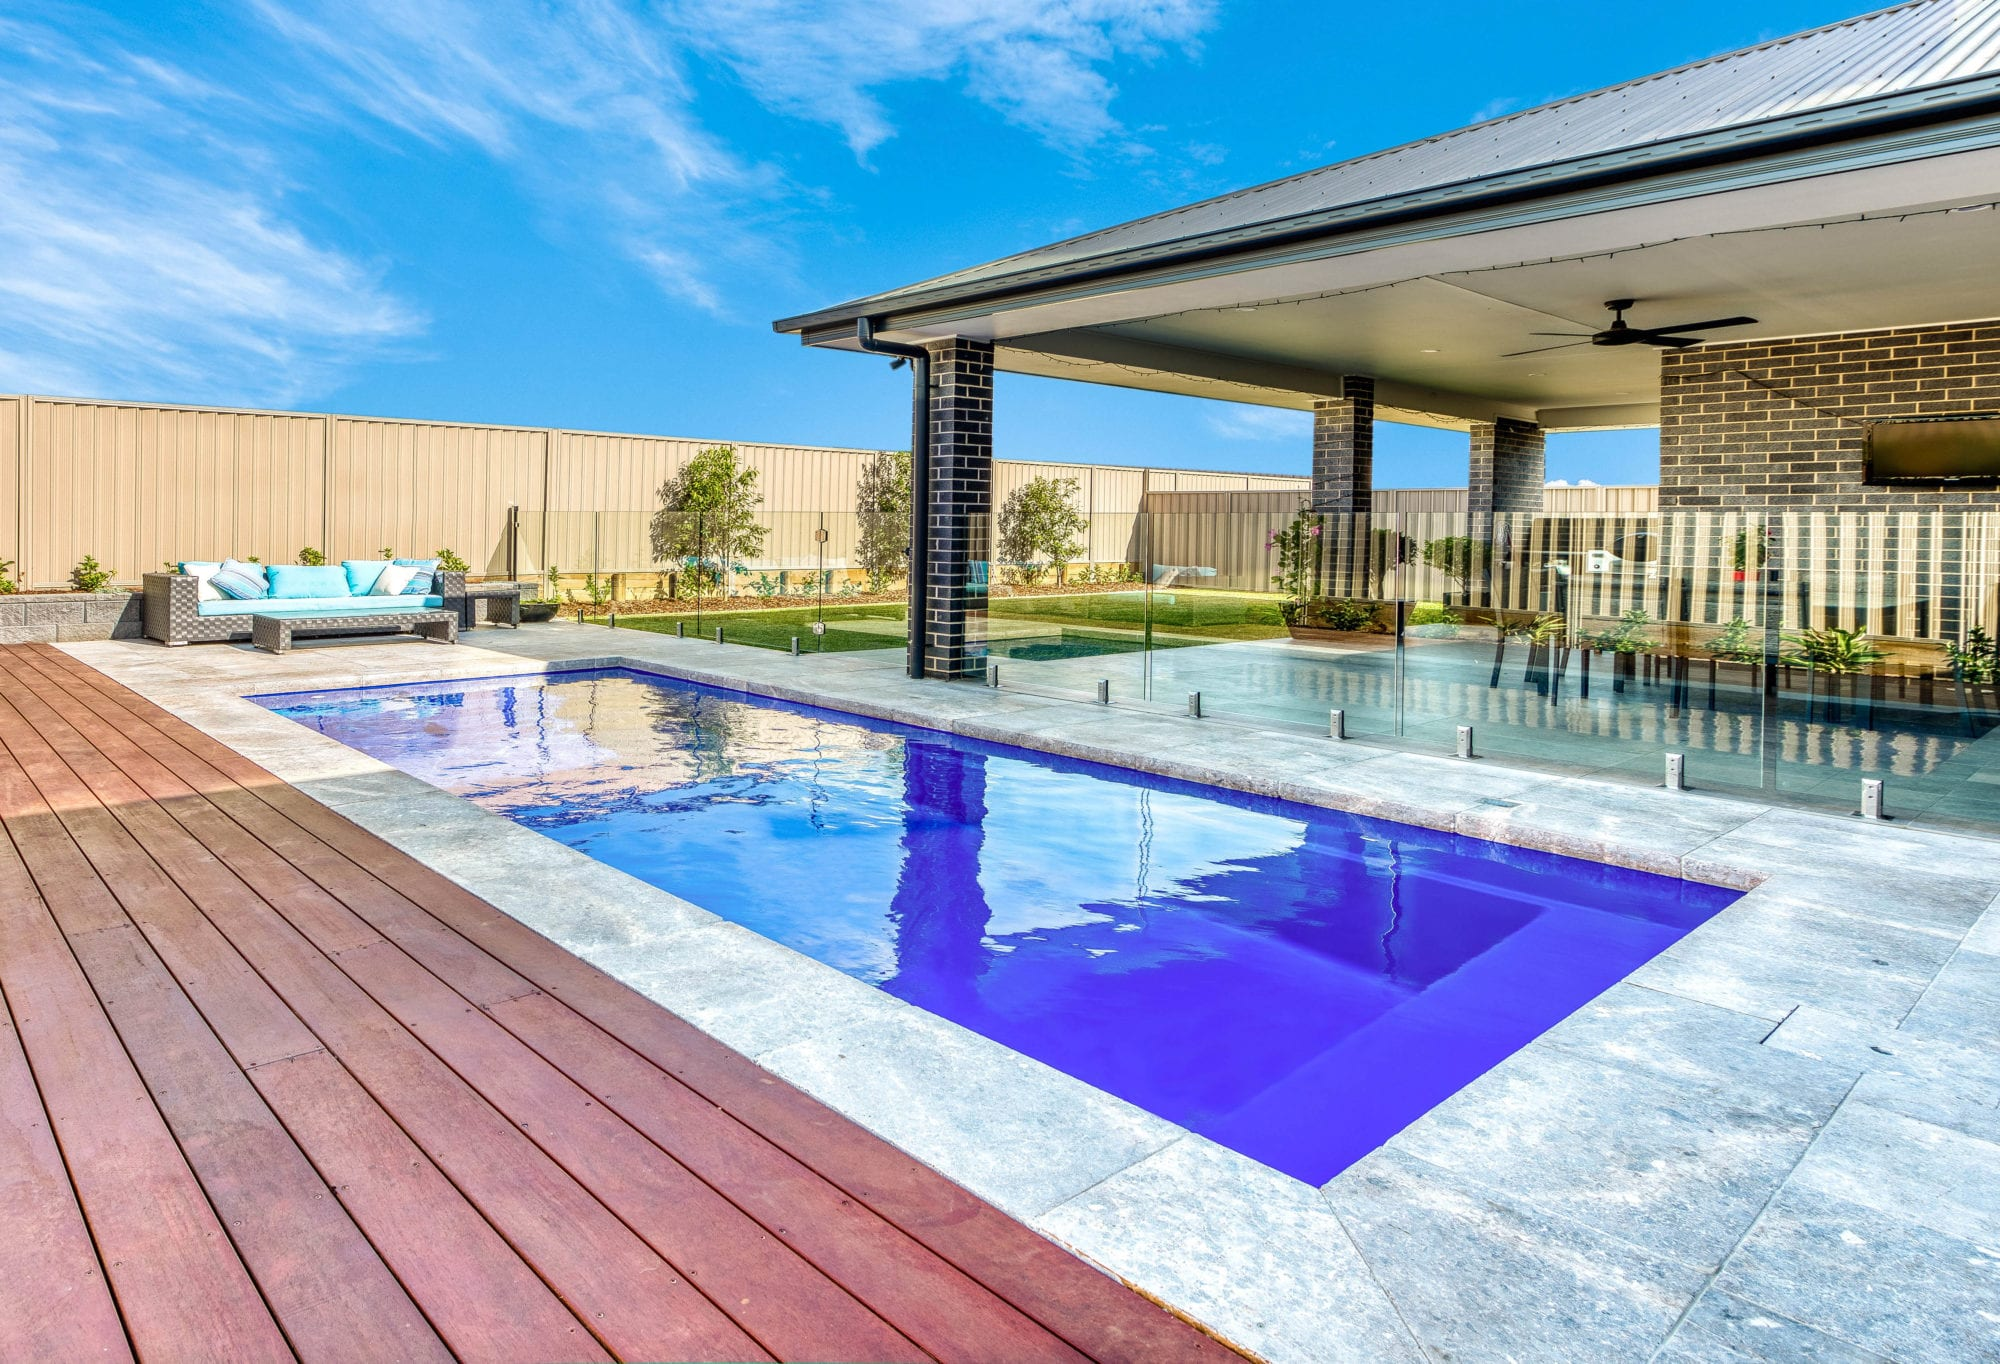 Avanti Pool design by Port Pools by Design